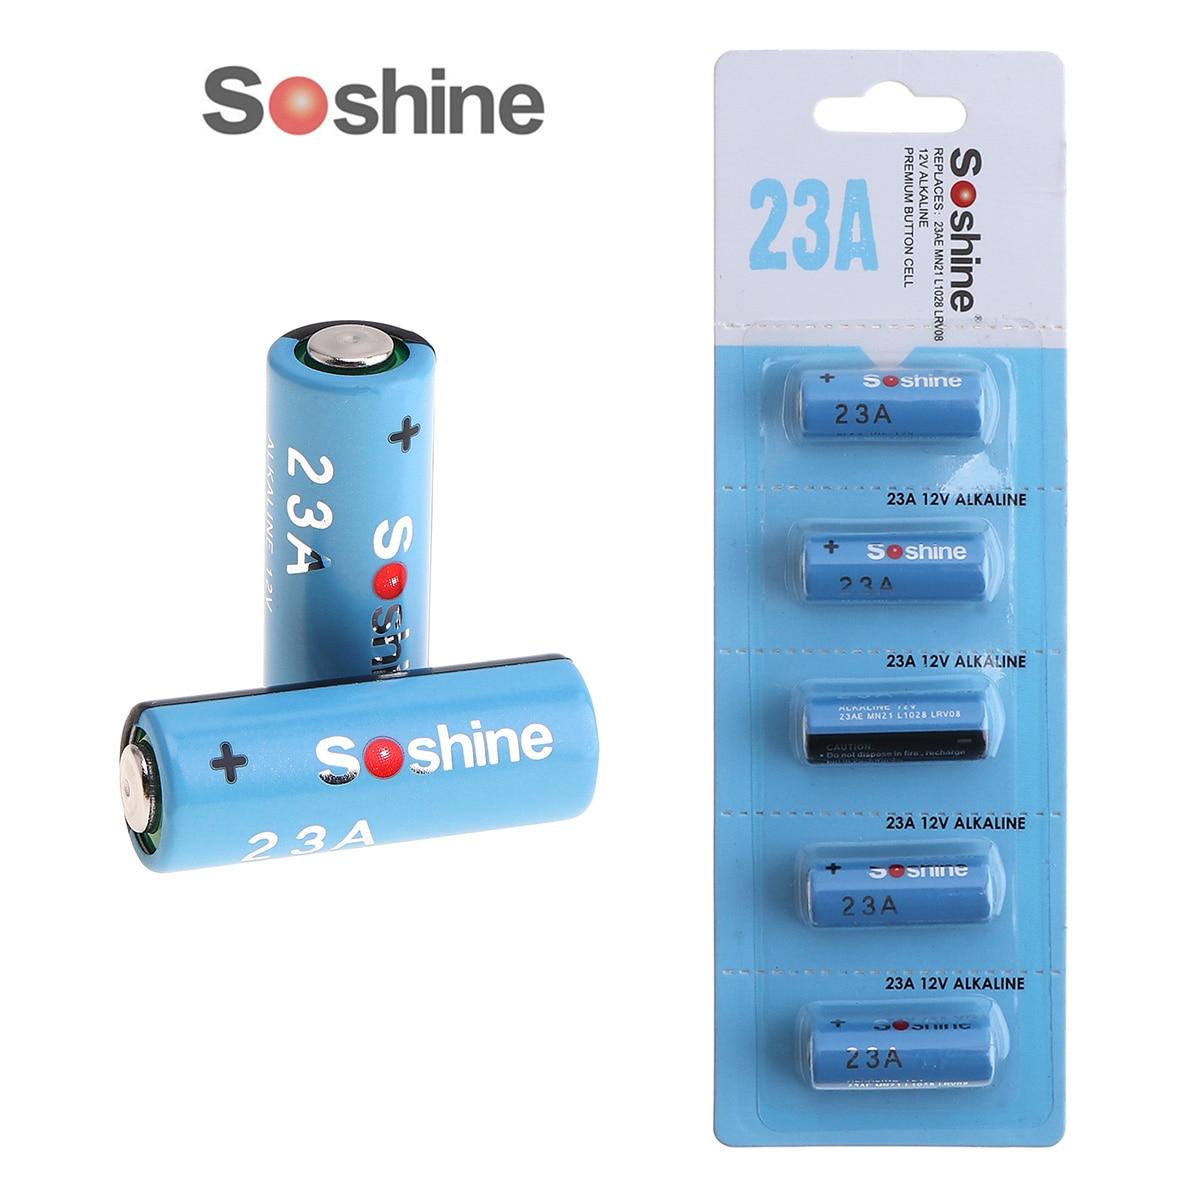 5pcs Soshine 23A 12V Battery High Performance MN21 L1028 LRV08 Alkaline Dry Battery for Remote Control Doorbell Garage Door